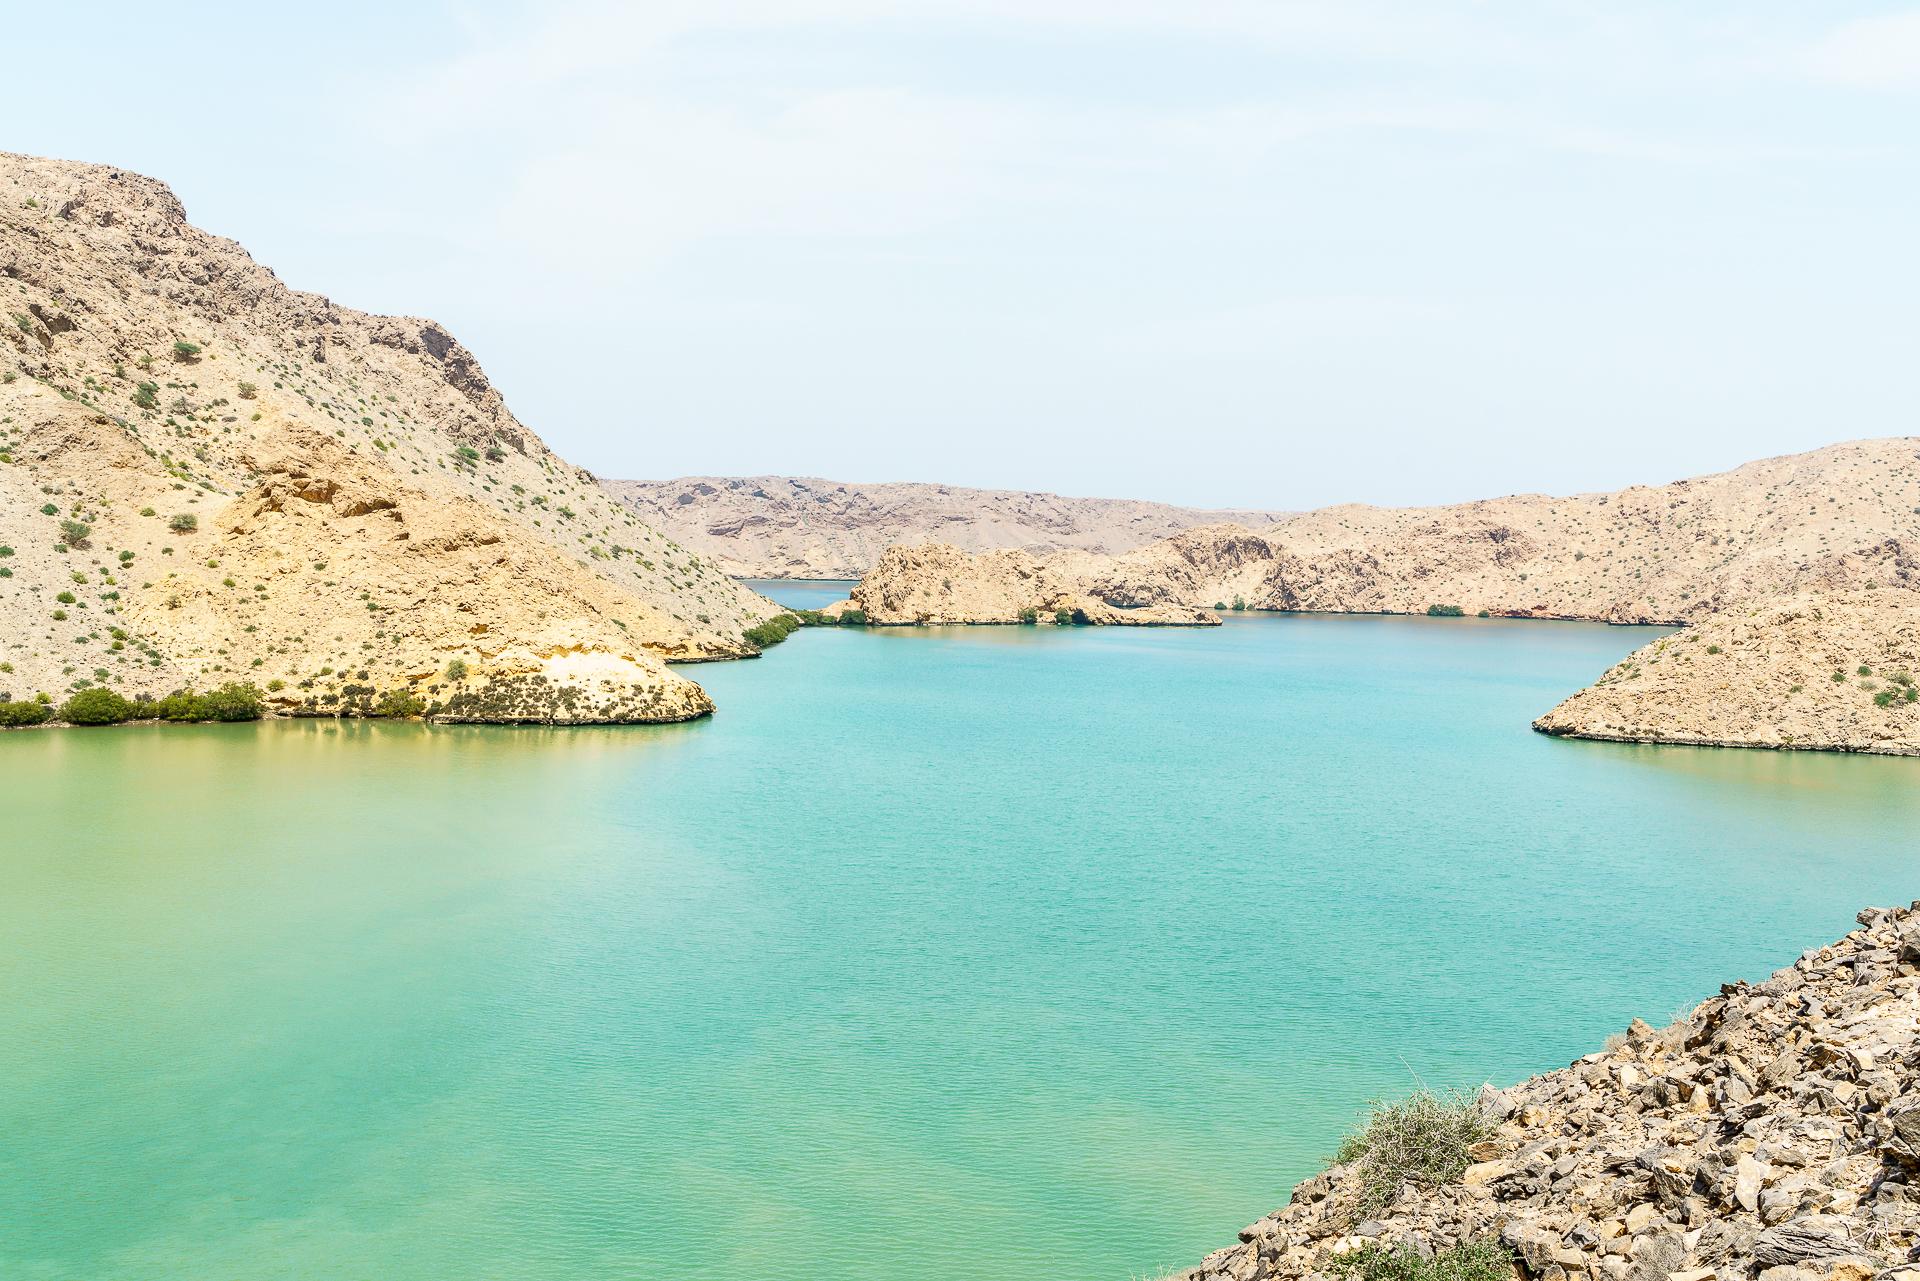 Karte Oman Salalah.Oman Roadtrip Offroad Von Muscat Nach Nizwa Rundreise